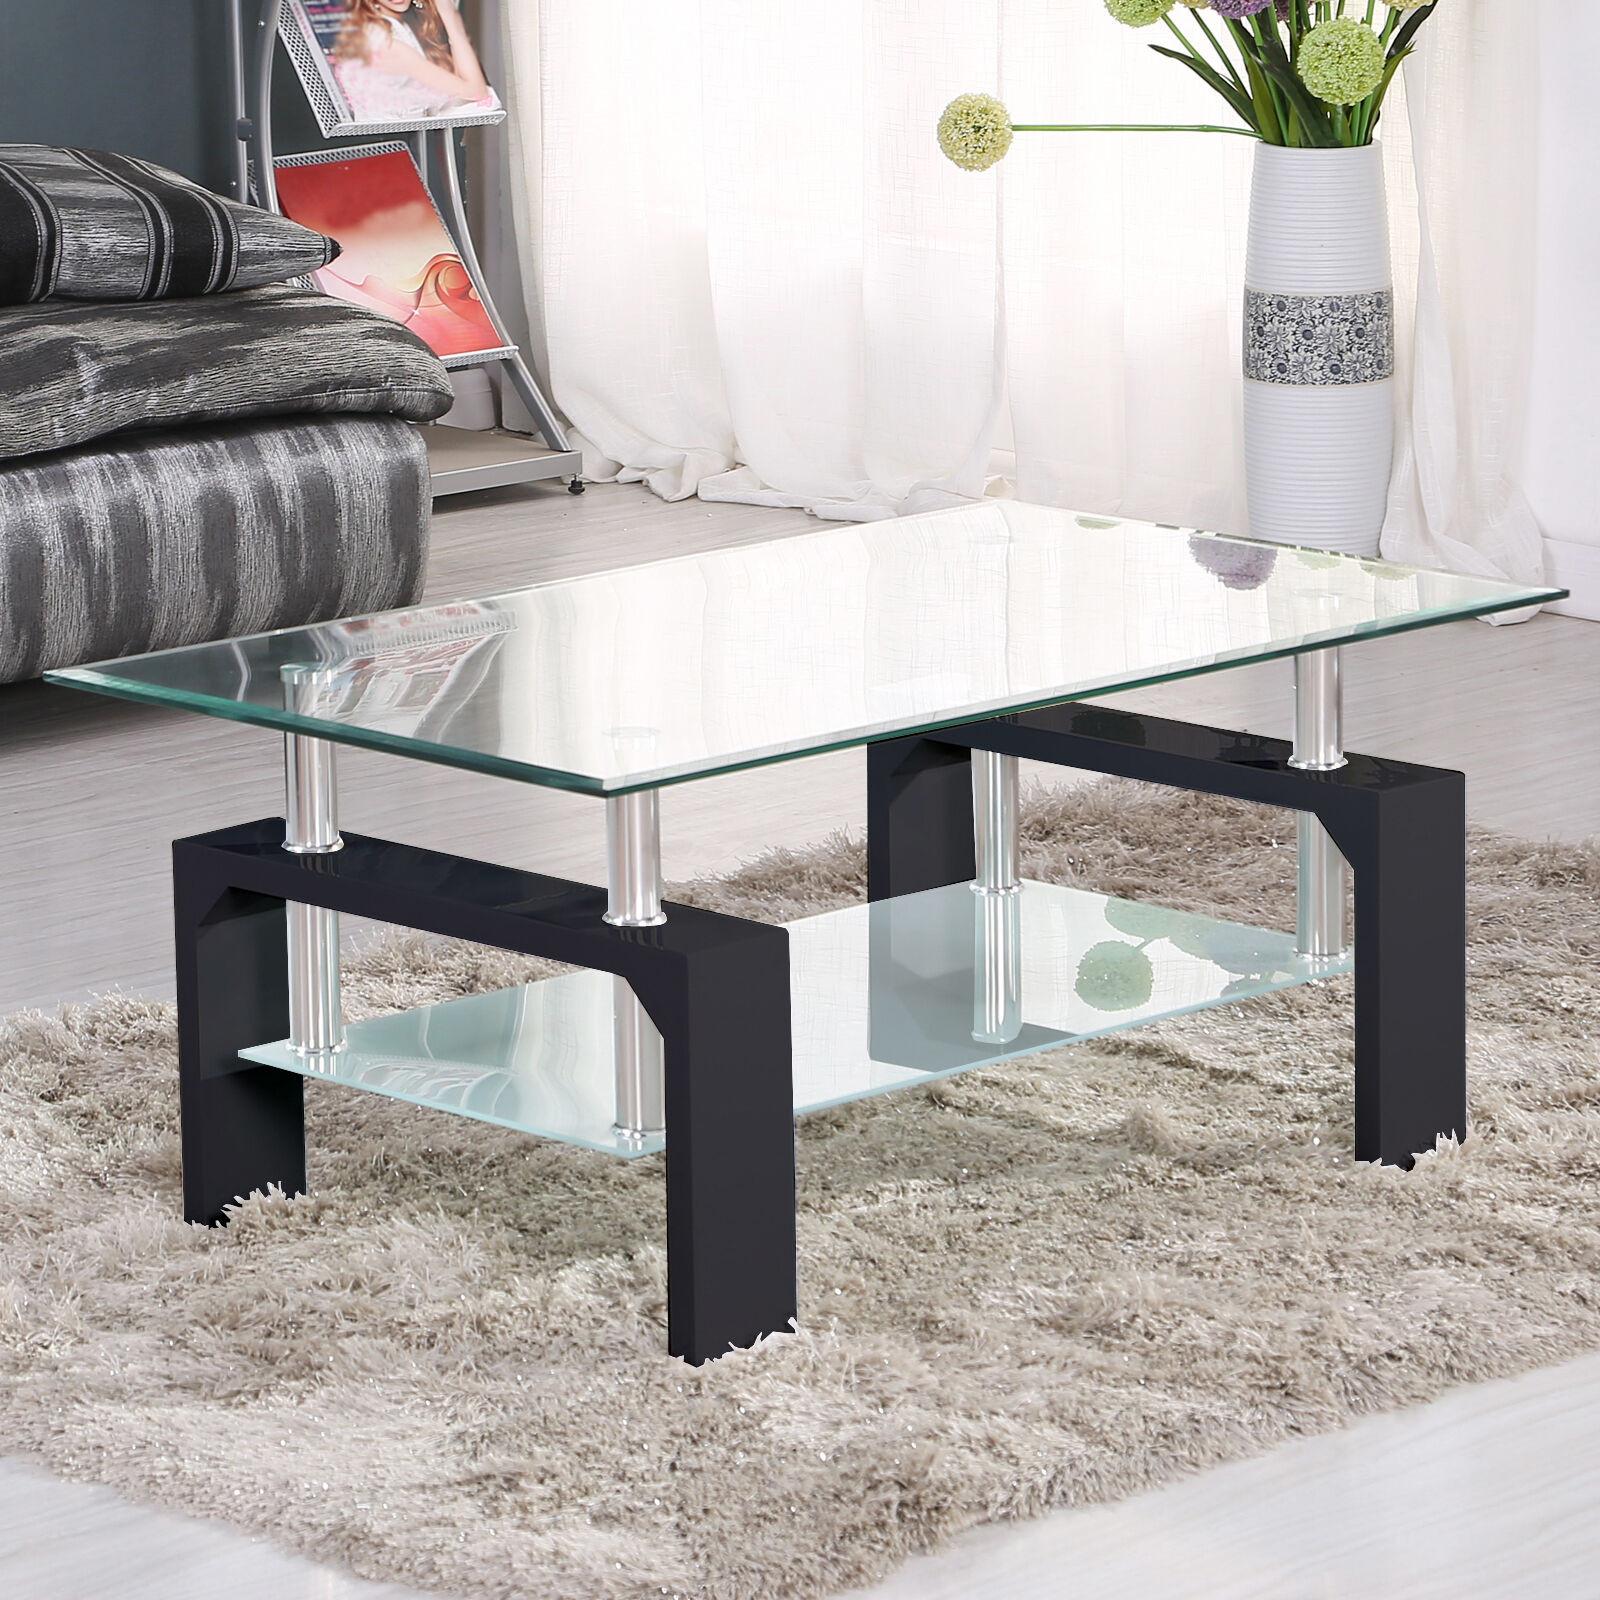 Living Room Glass Table  Modern Rectangular Black Glass Coffee Table Chrome Shelf